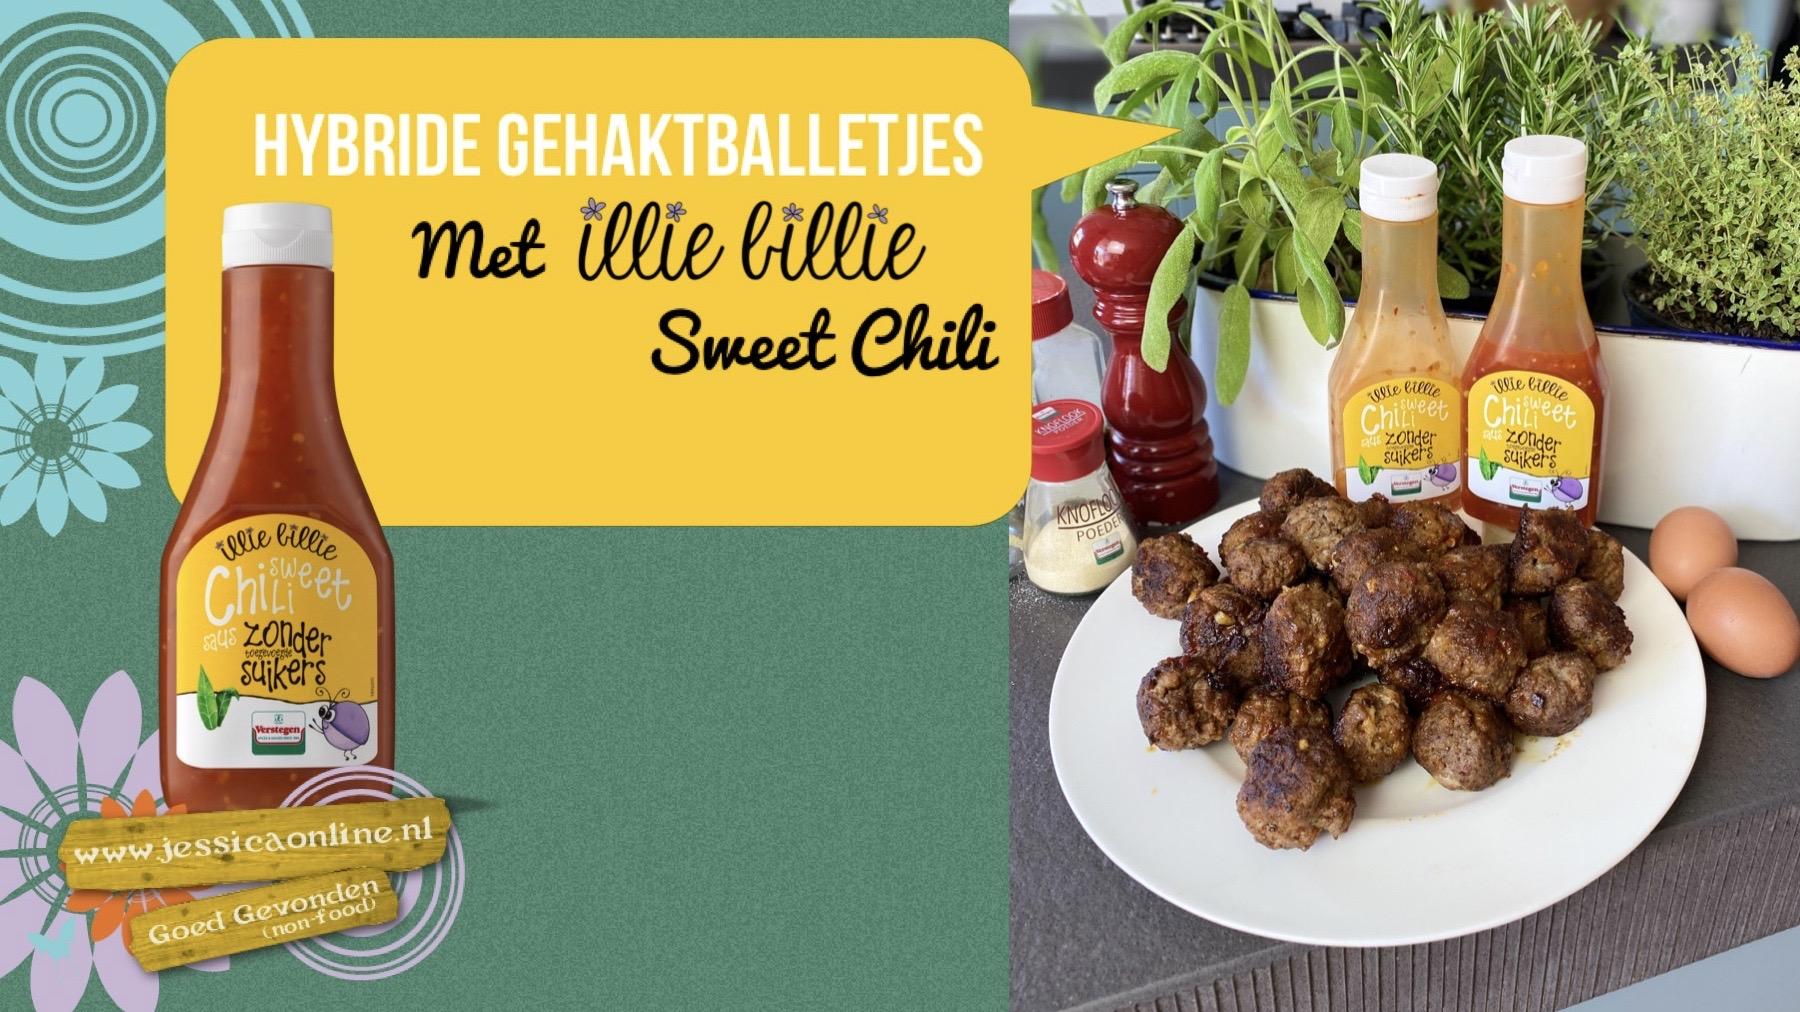 hybride gehaktballetjes met illie billie sweet chili - Jessicaonline.nl